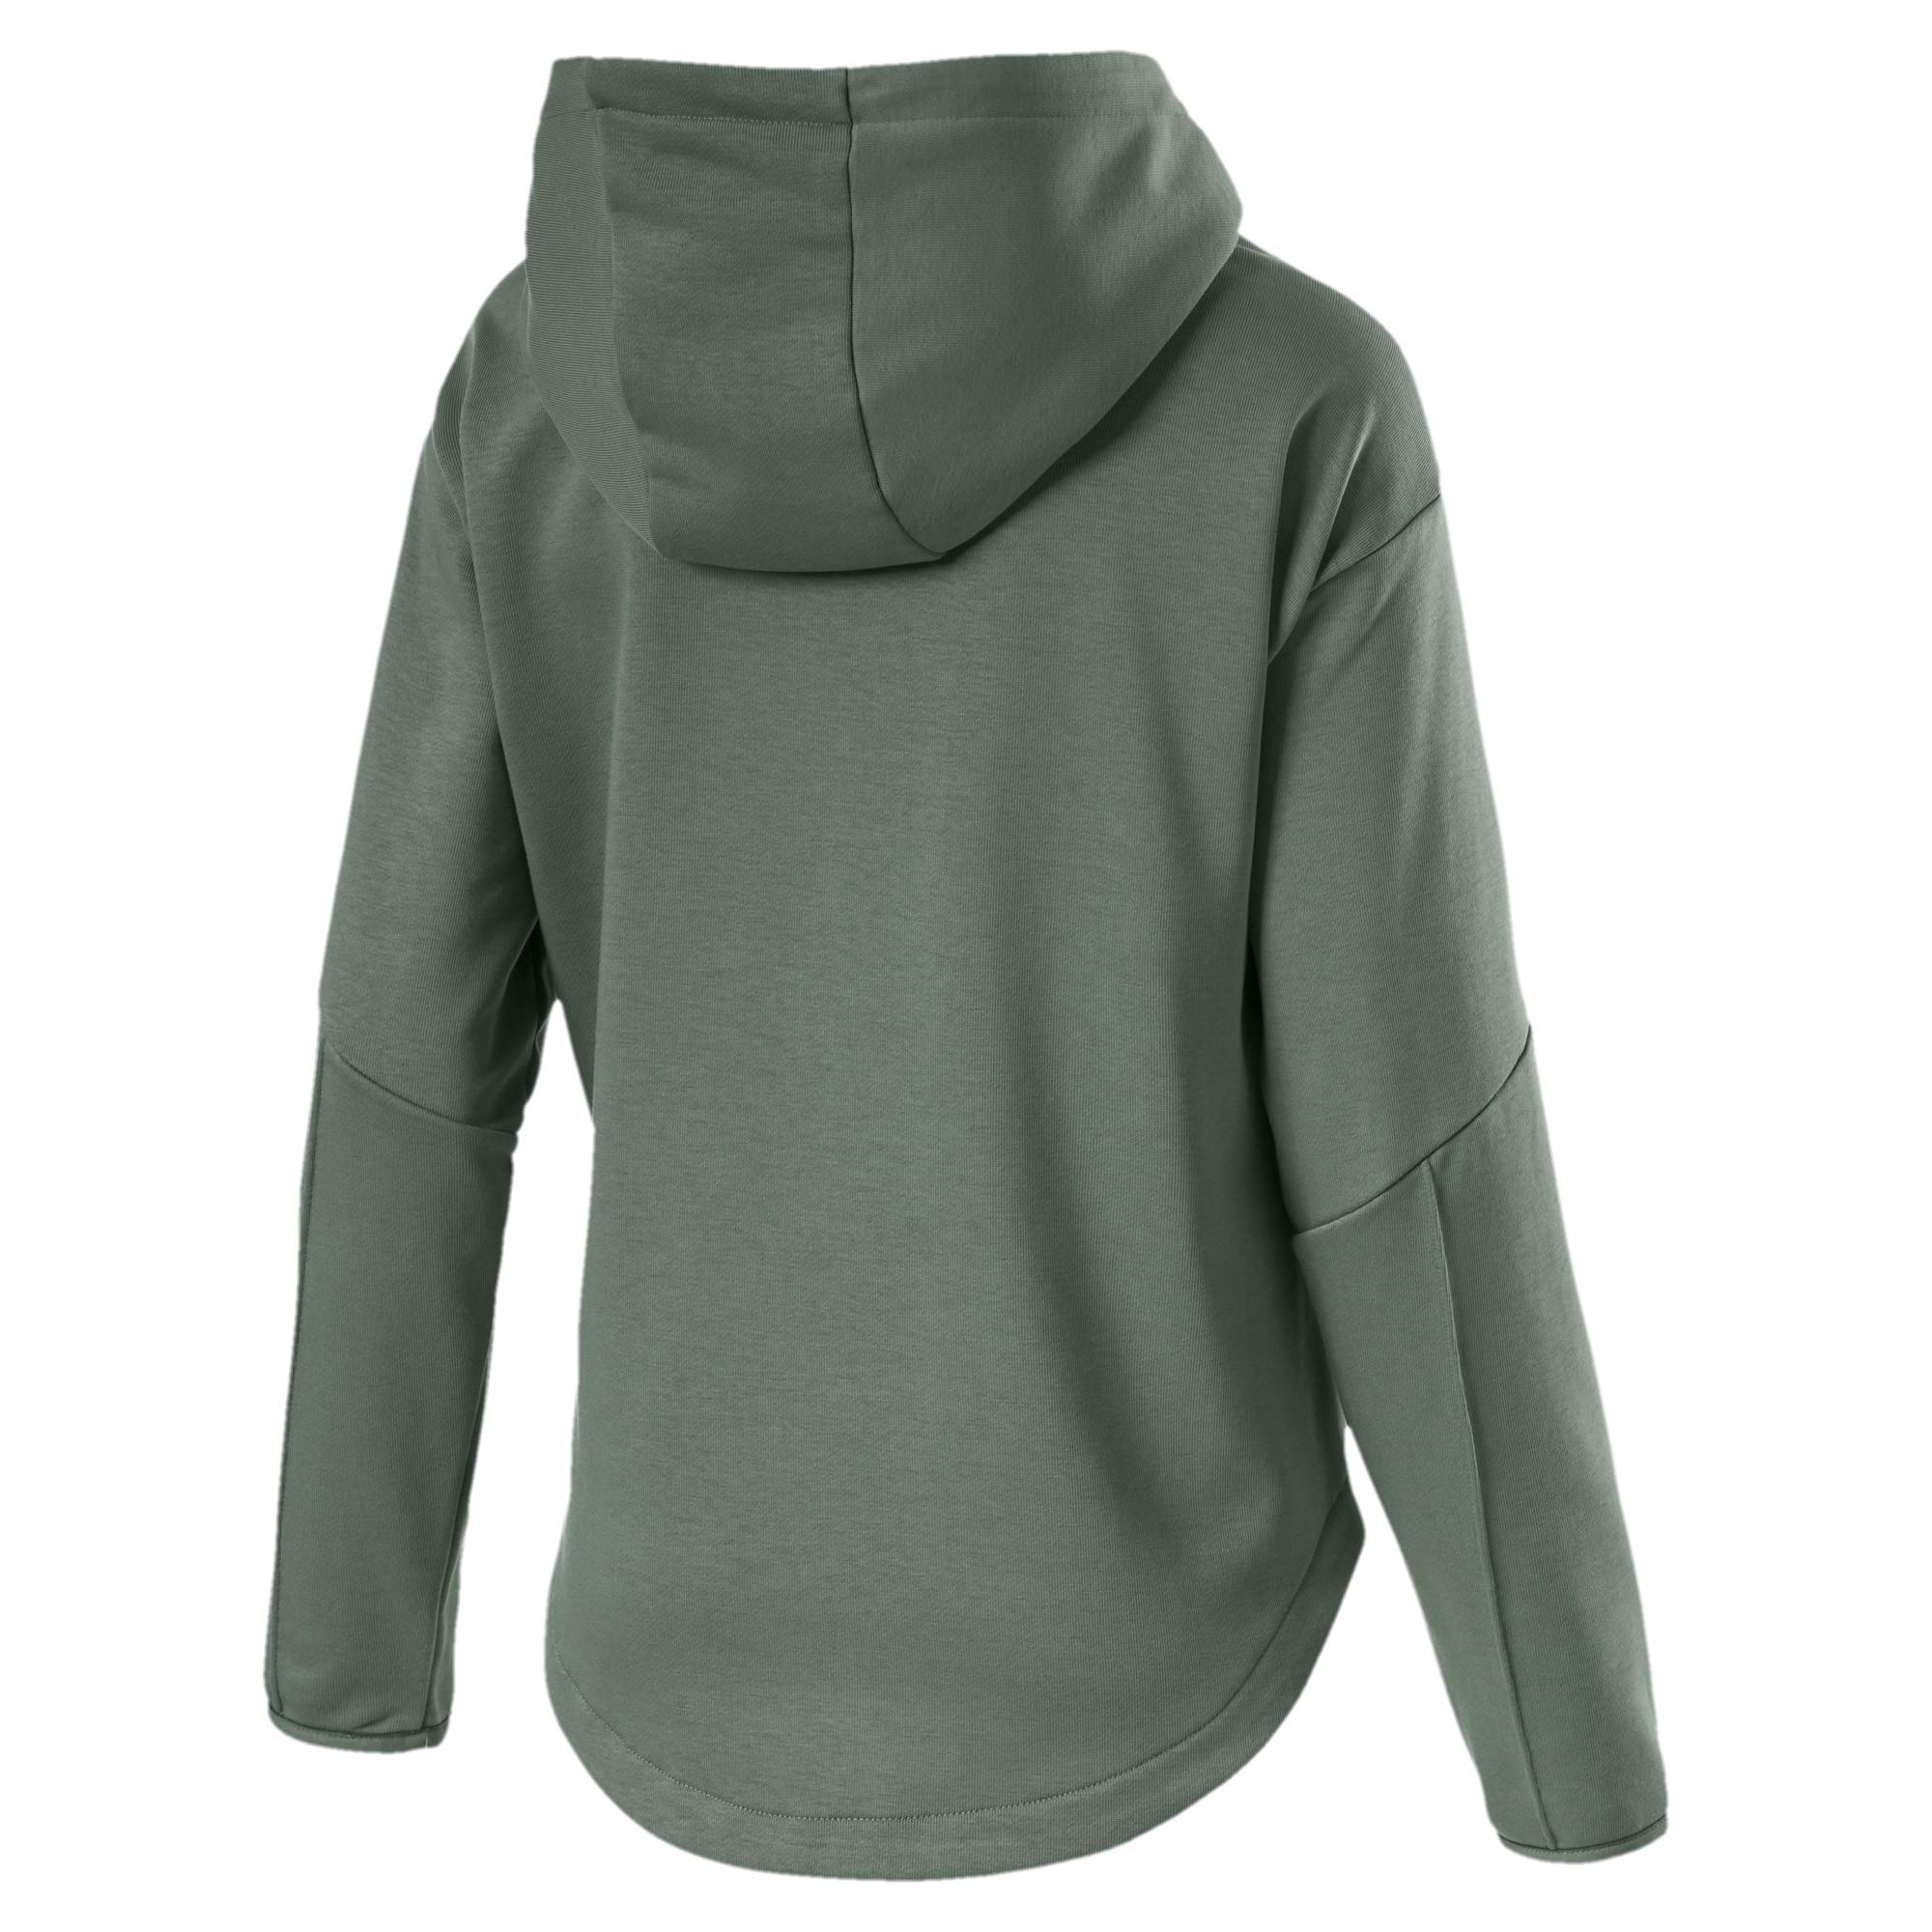 e4ac98ec4d48 Lyst - PUMA Ferrari Lifestyle Women s Hooded Sweat Jacket